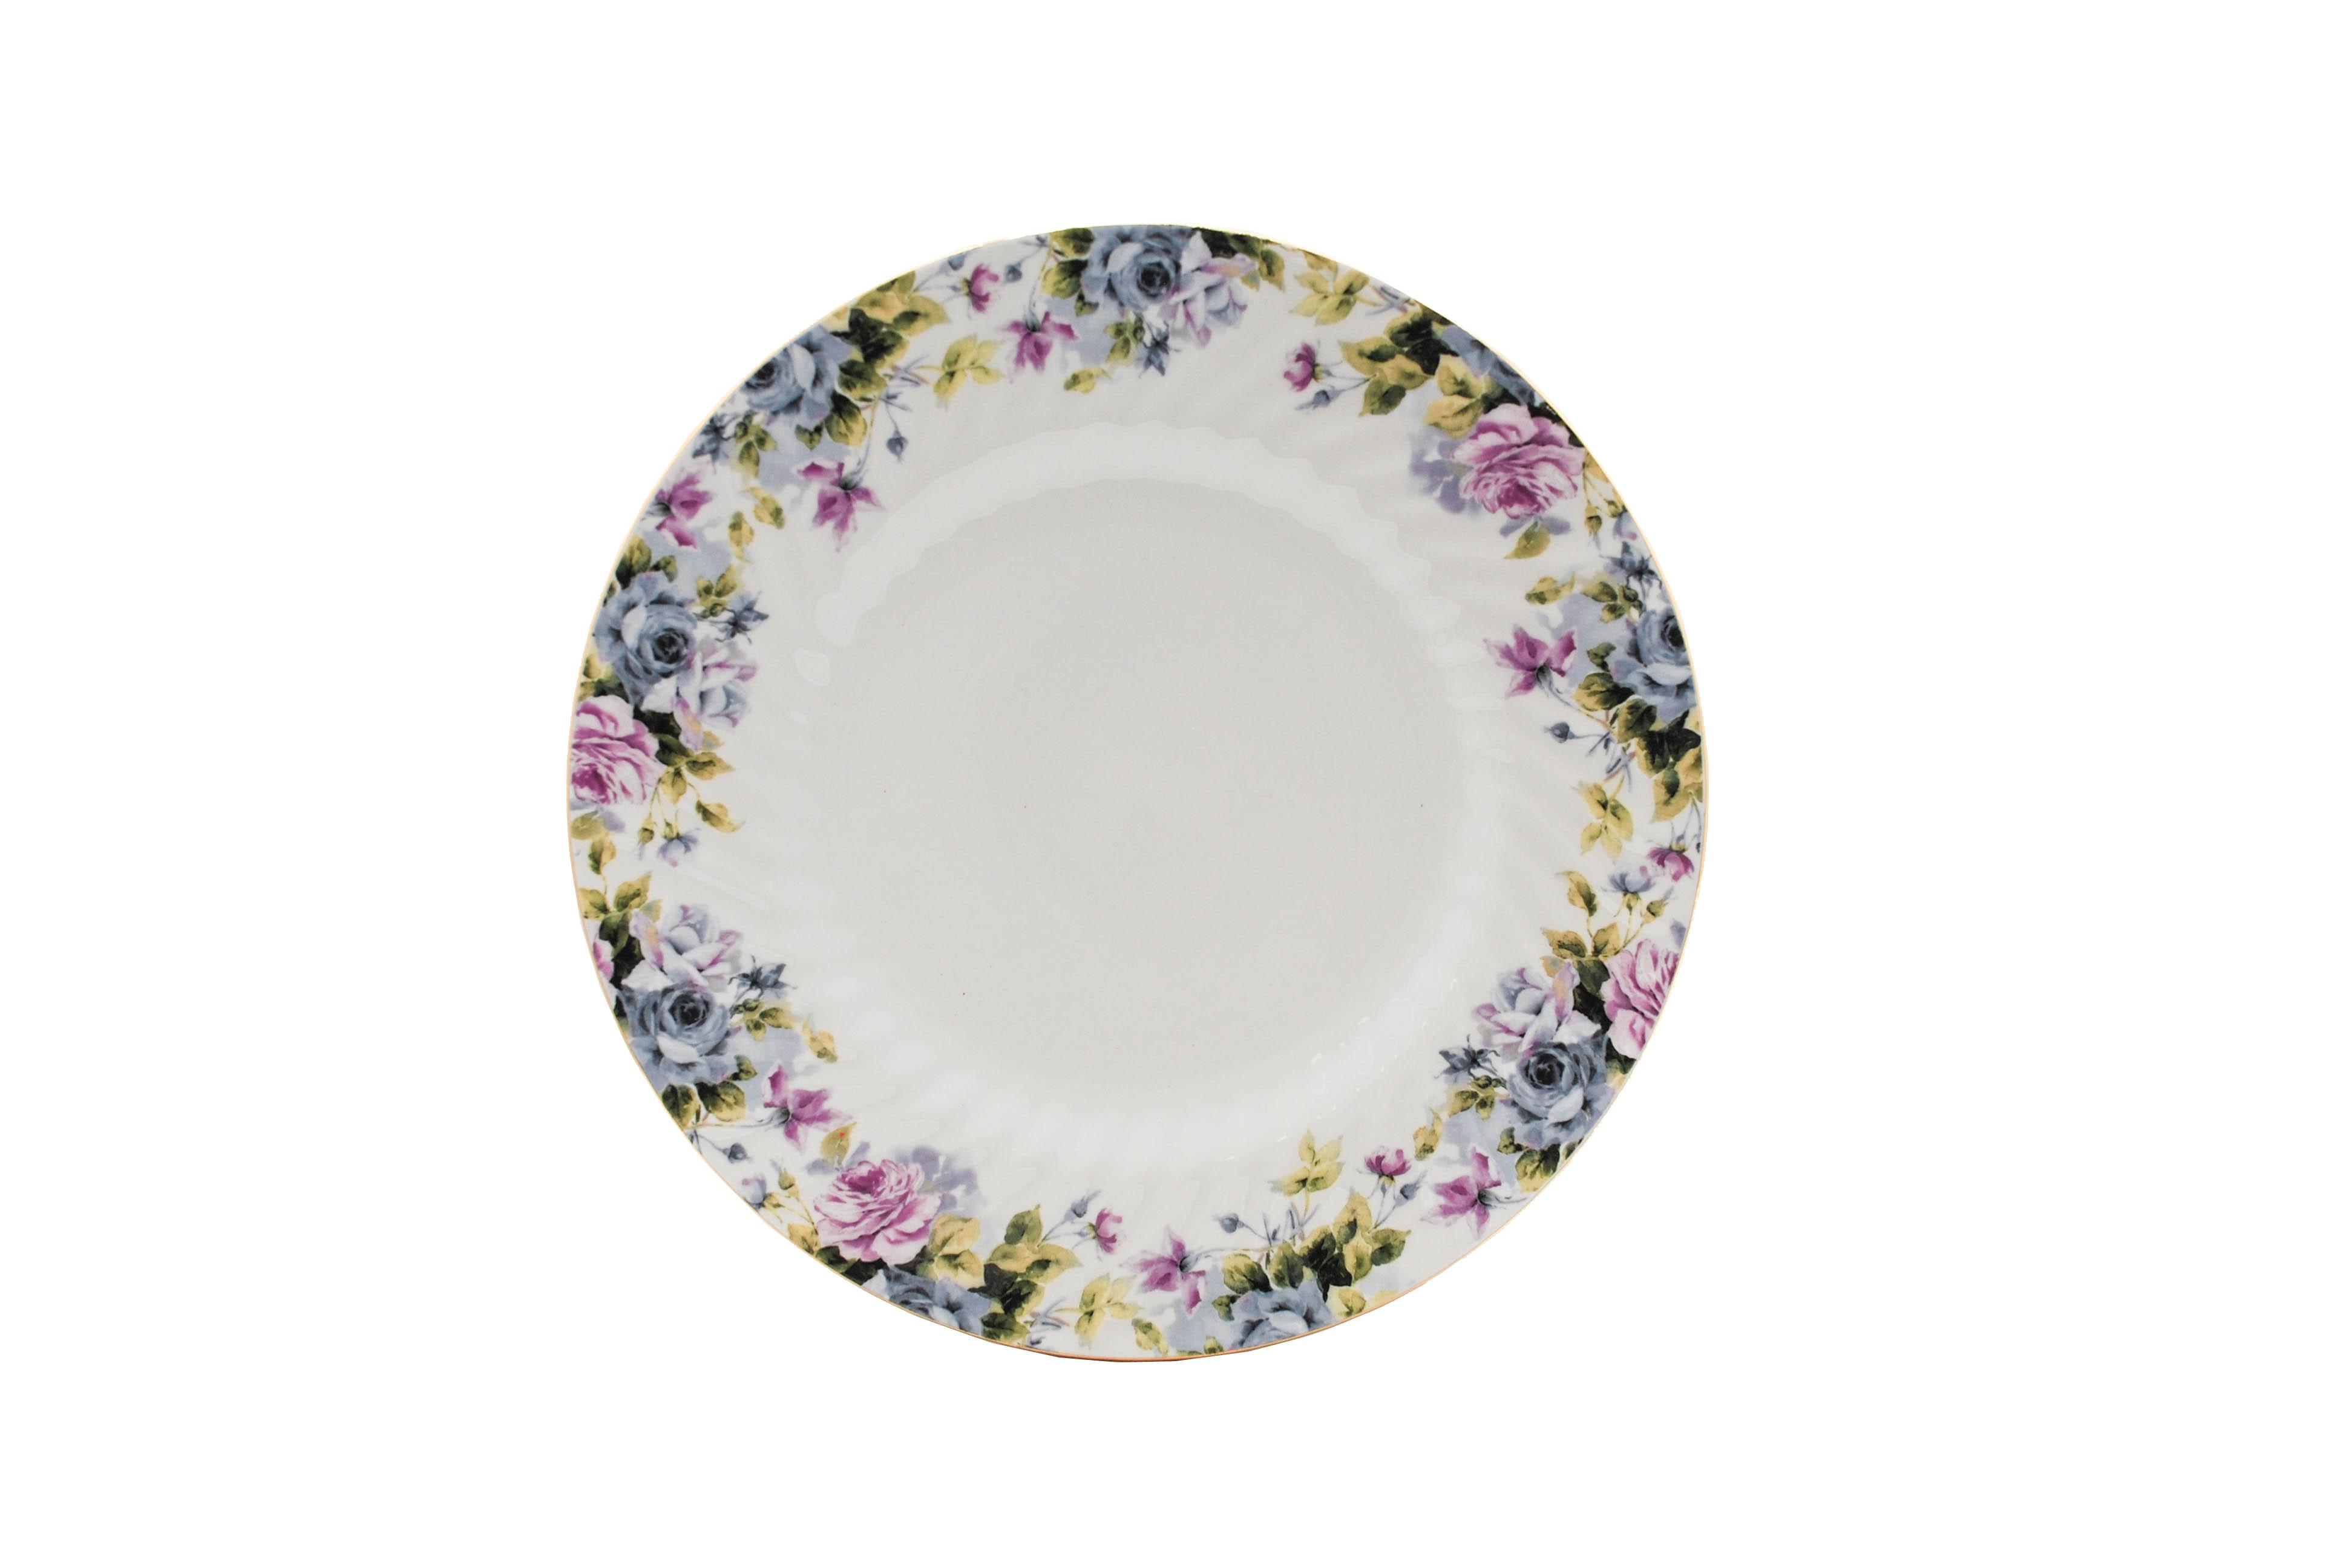 "Millicent 7.5"" Salad/Dessert Plate"